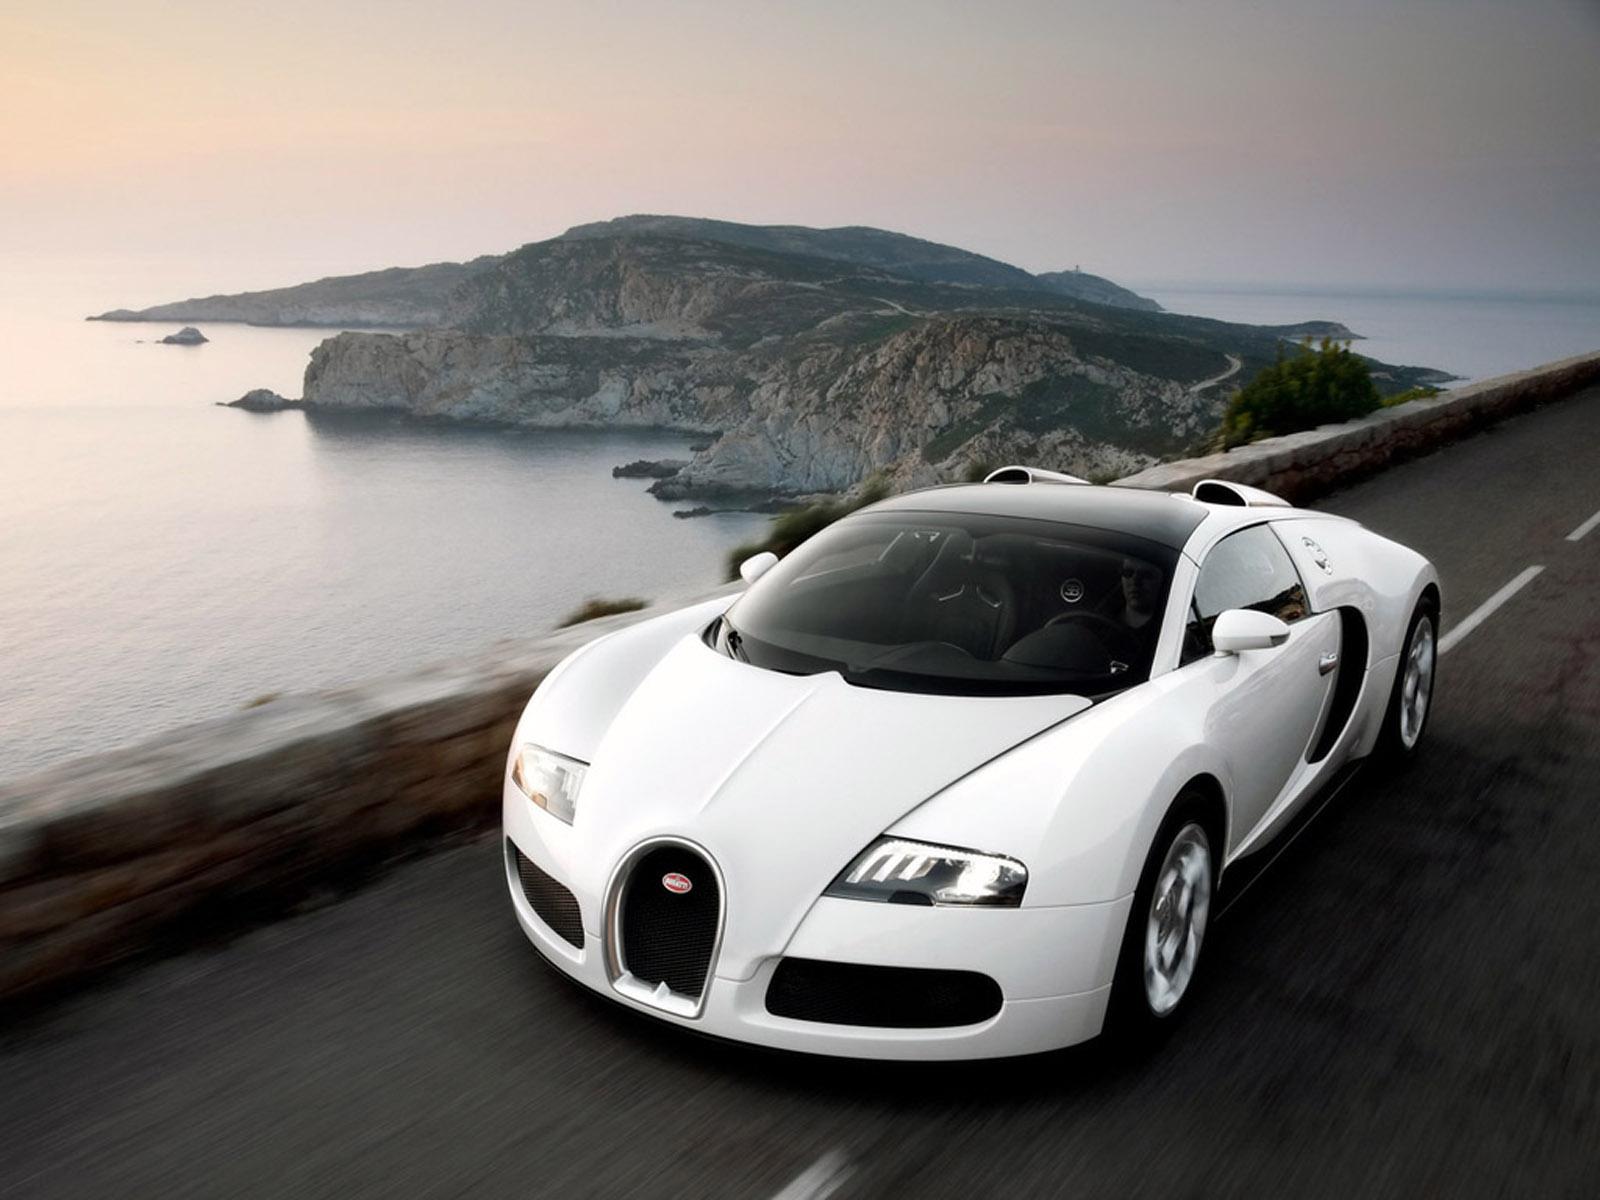 bugatti veyron pictures specs price engine top speed bugatti 164 veyron grand sport full view jpg